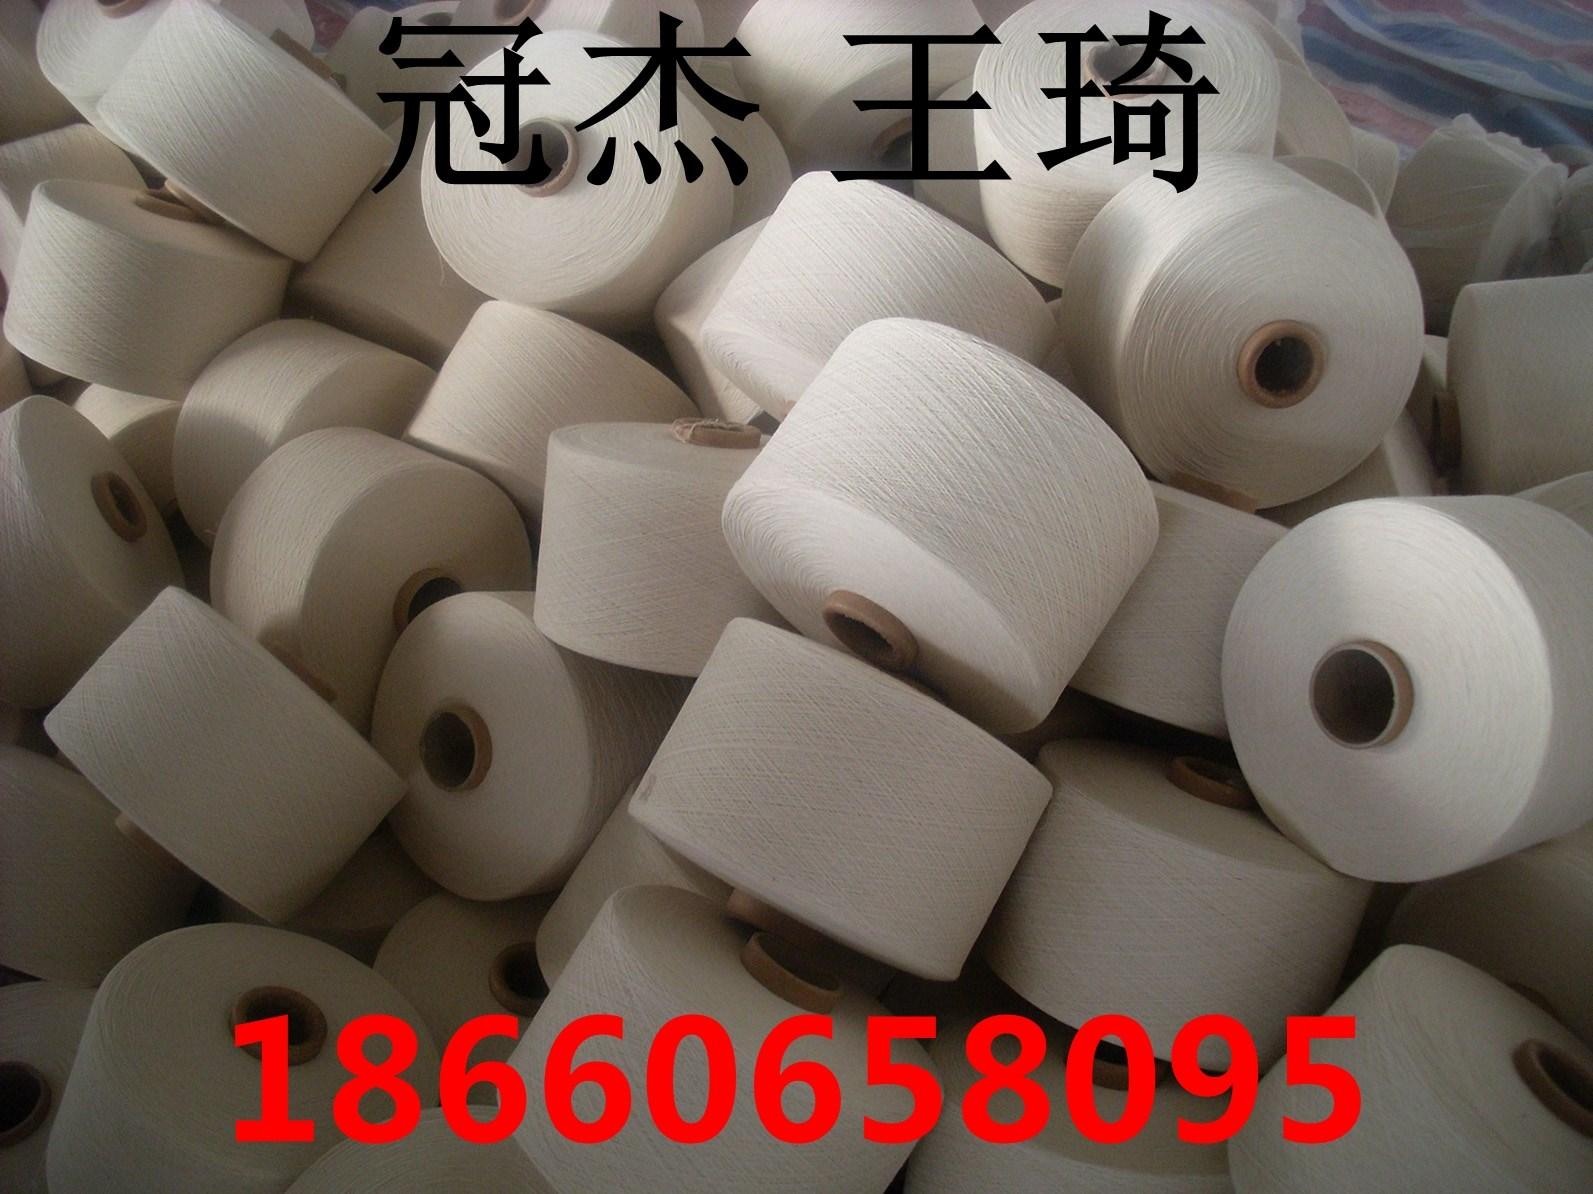 R60/C40 40支2股 40s/2 棉粘股线图片一